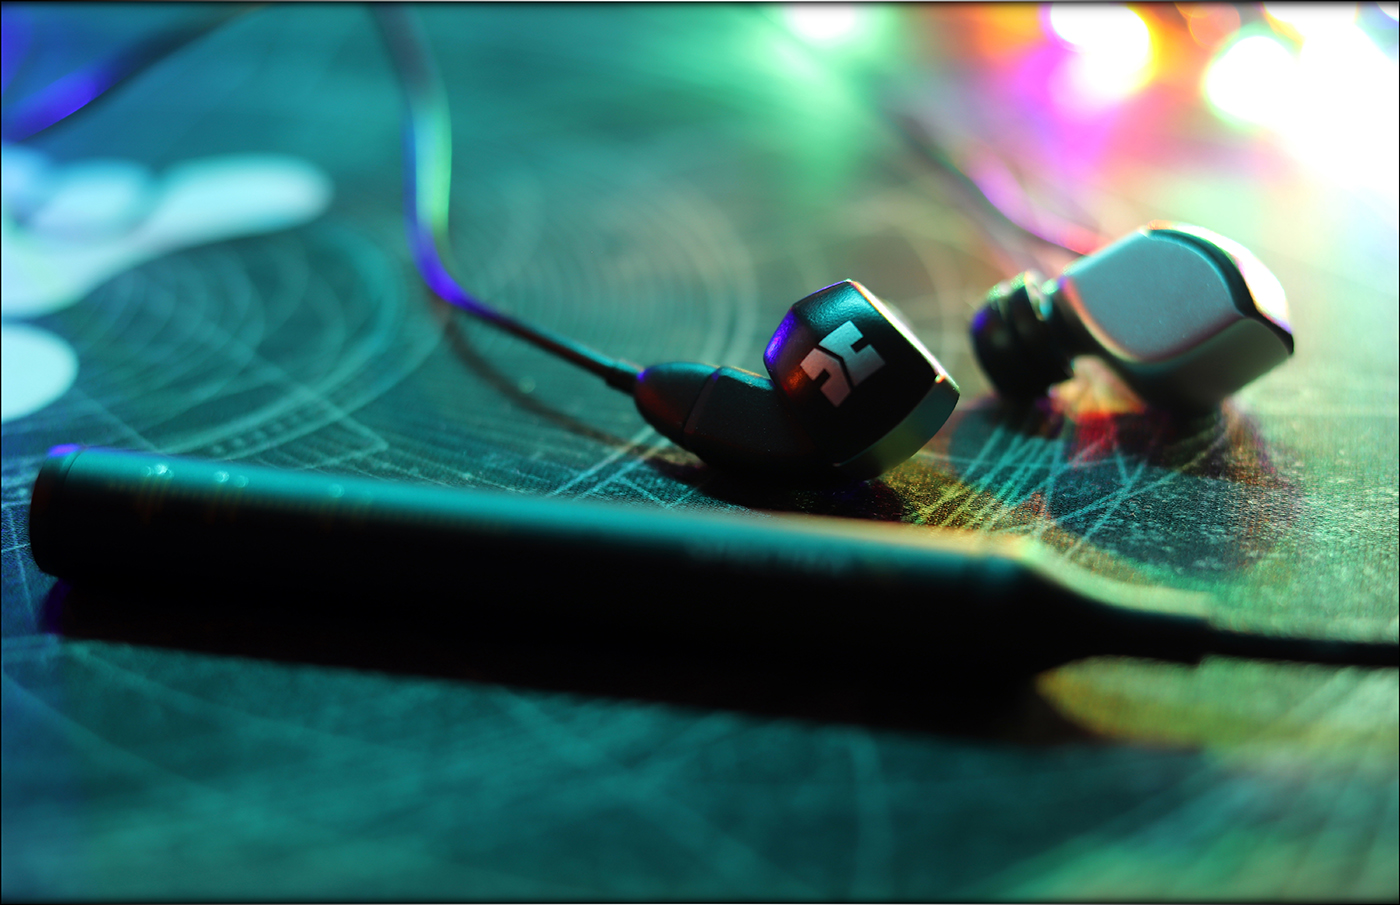 Magic Wand - NextDrive SpectraX Portable DAC/AMP Review - Audiophile